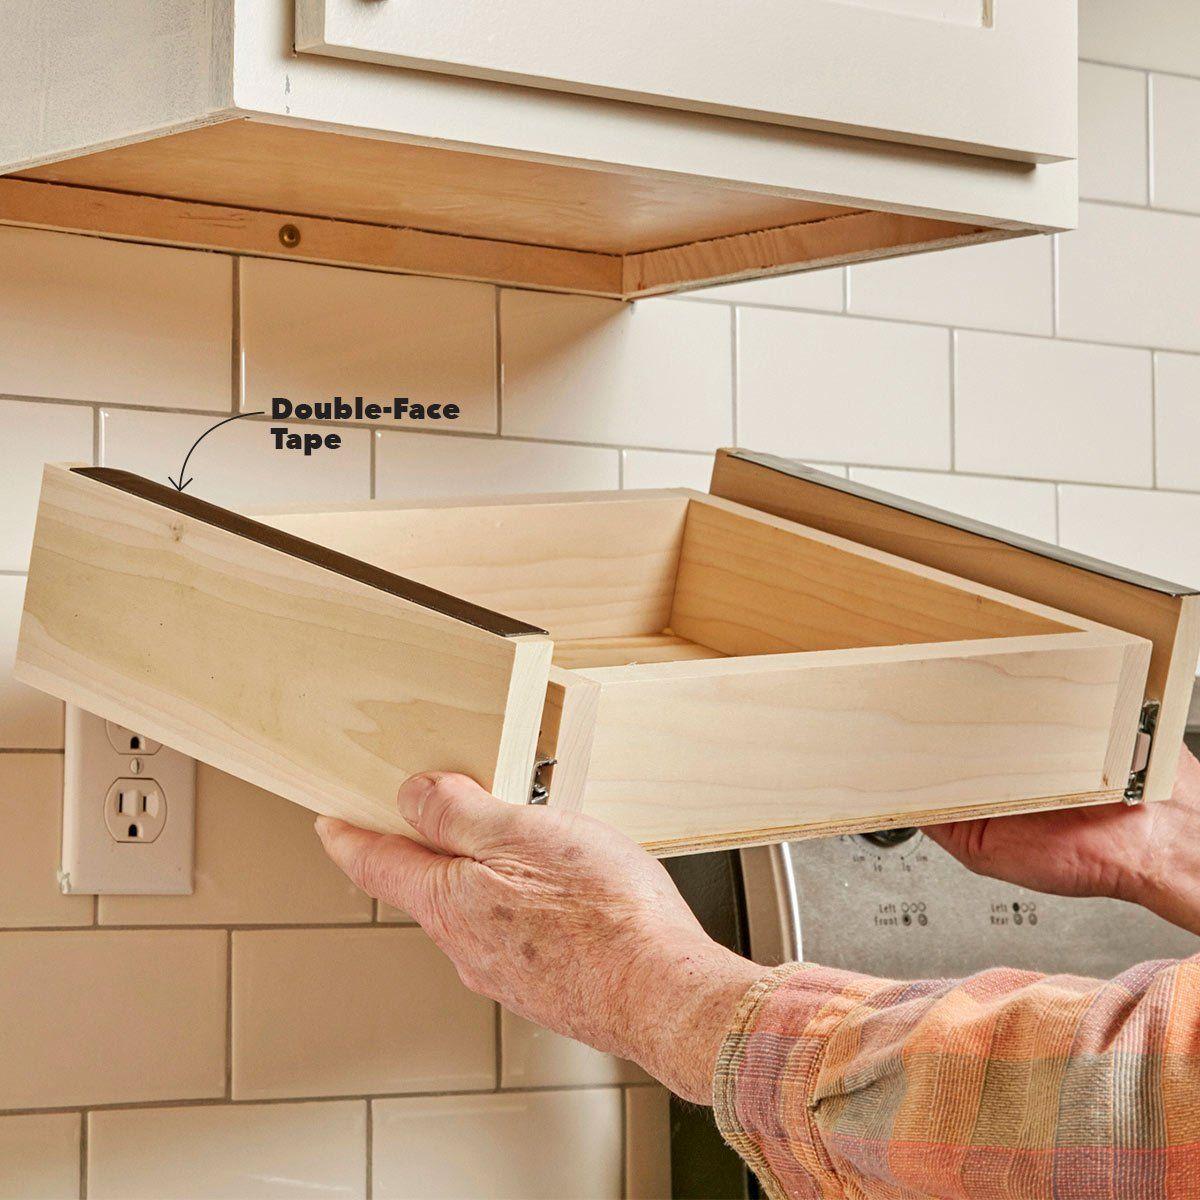 Easy to Extra Your Kitchen Storage - DIY Under-Cabinet Drawer